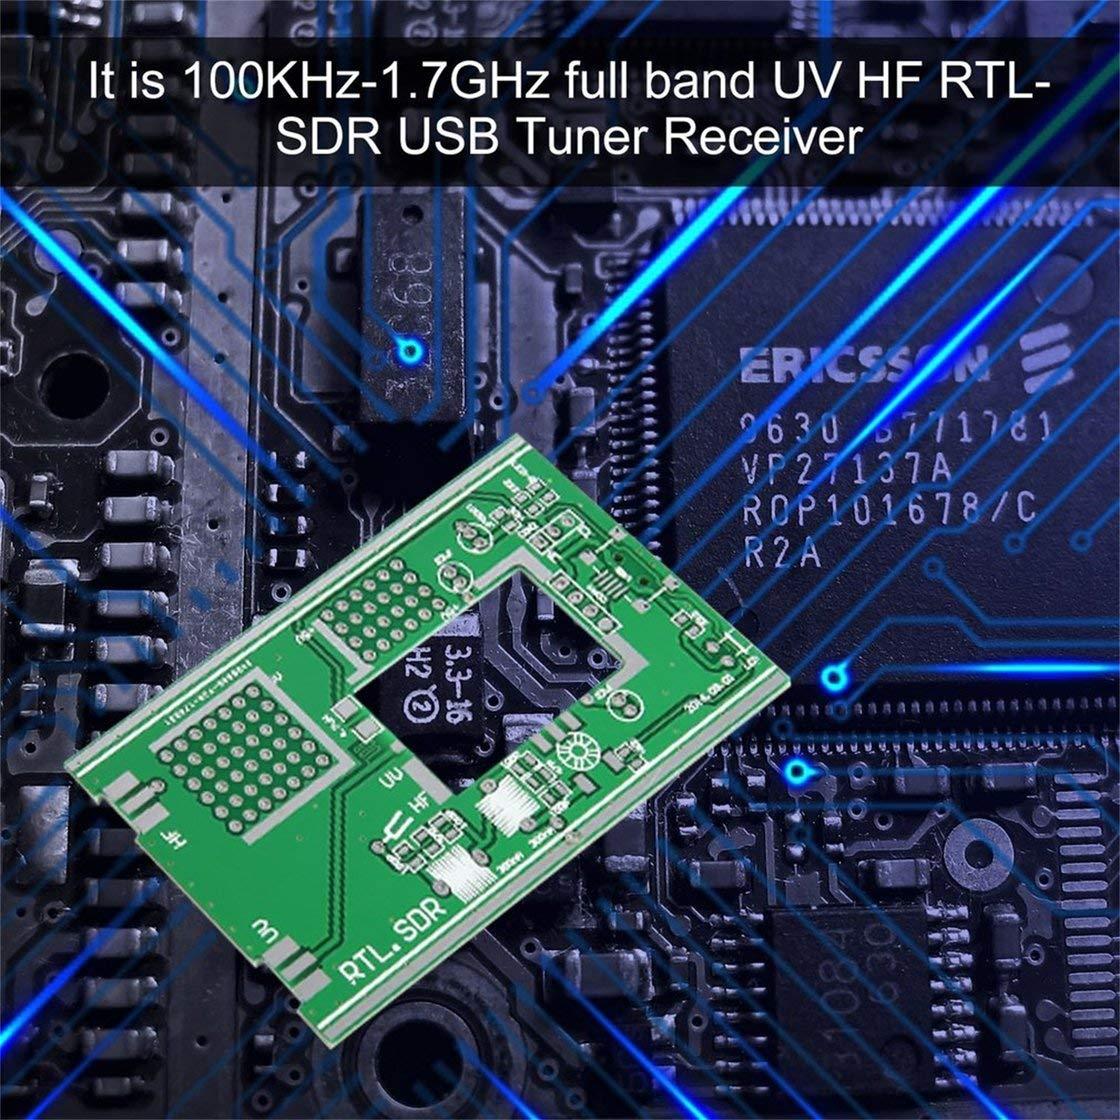 Laurelmartina 100KHz-1.7GHz Receptor de Banda Completa Software Radio UV HF FM Am RTL-SDR Sintonizador USB Receptor RTL2832U + R820T + U/V Antena Kits de ...